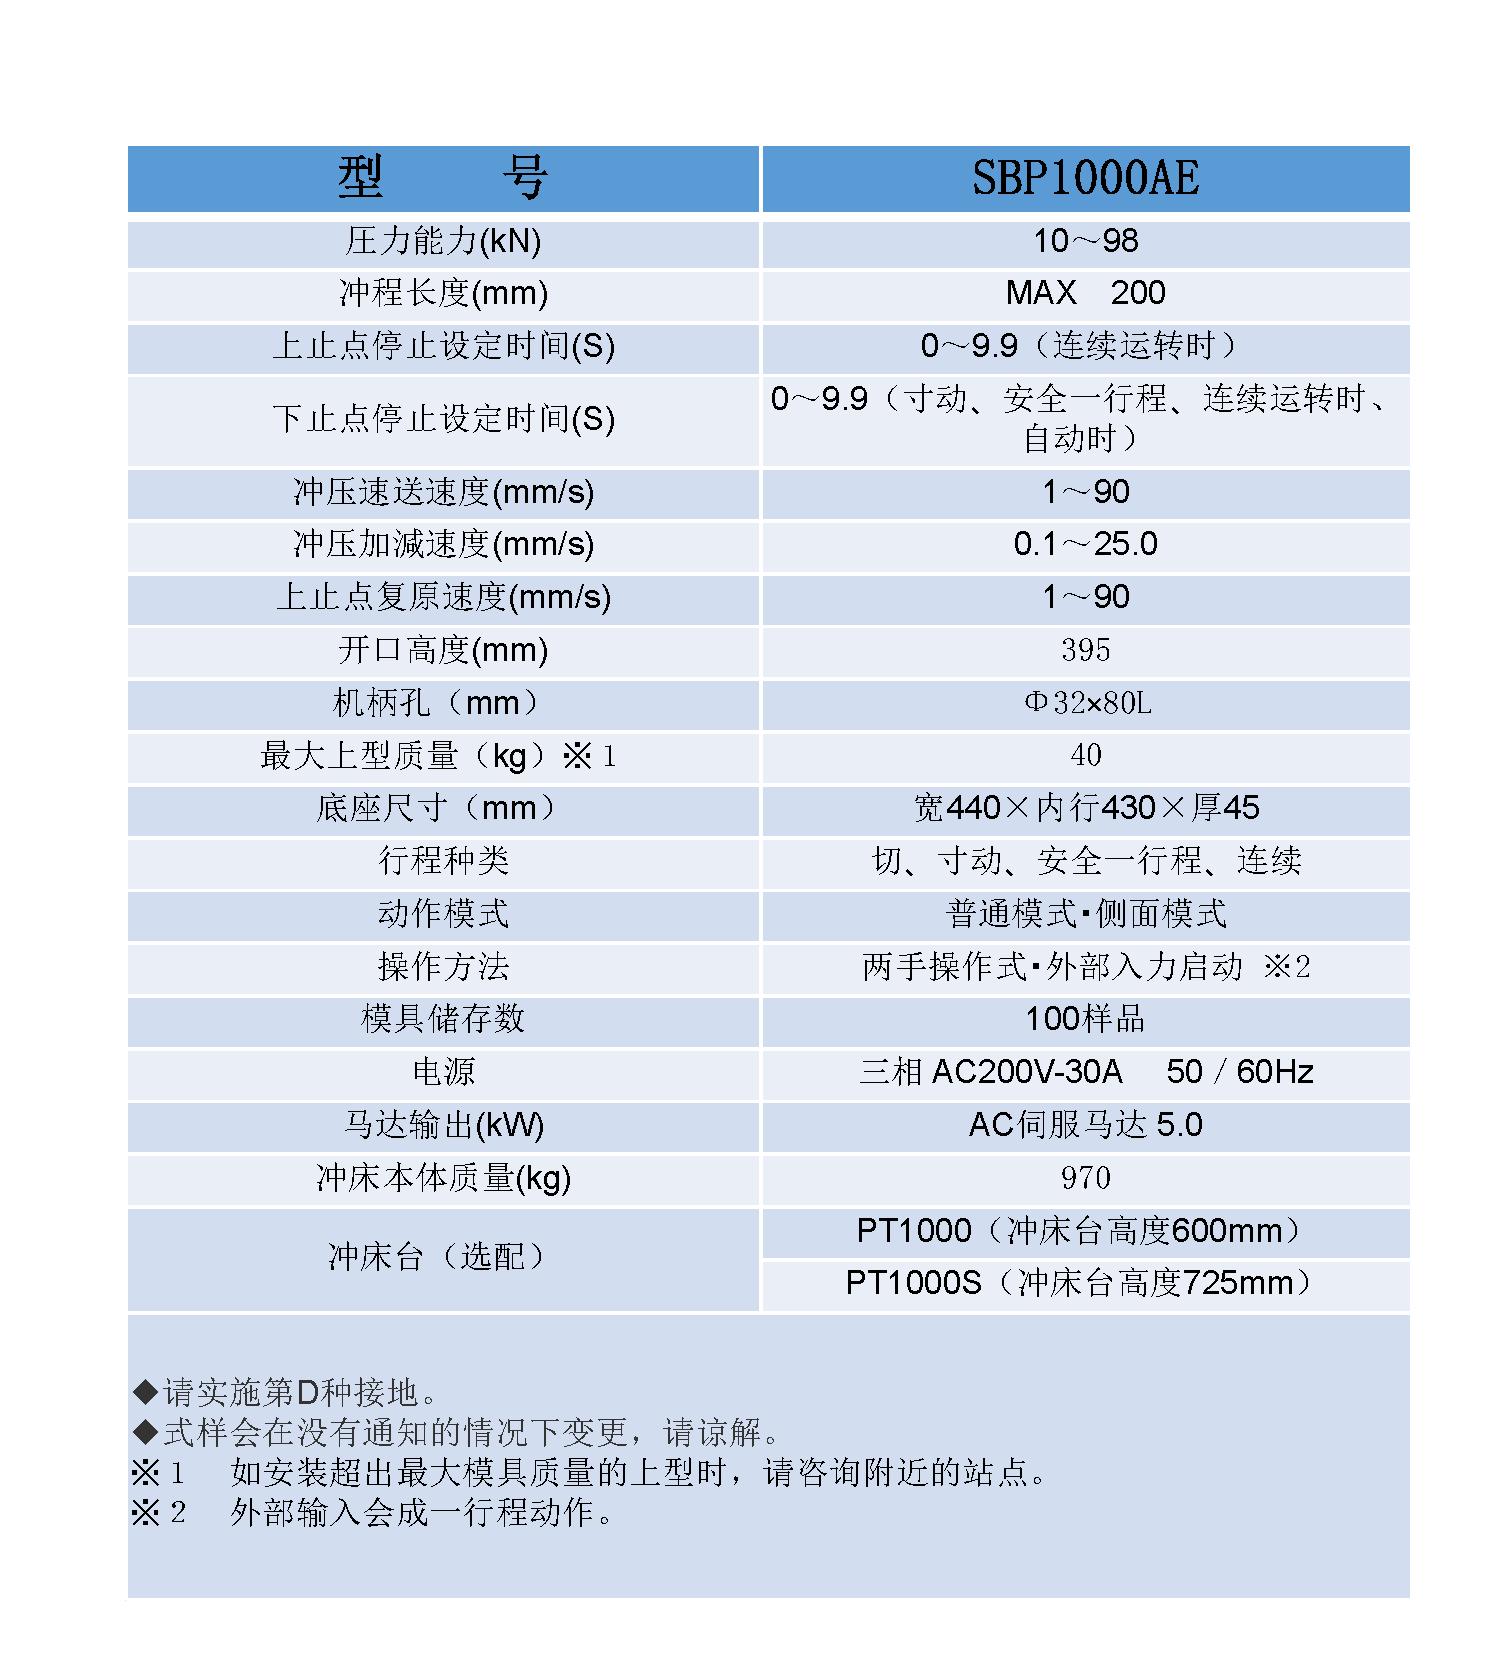 SBP1000AE_仕様_D - 中文.png